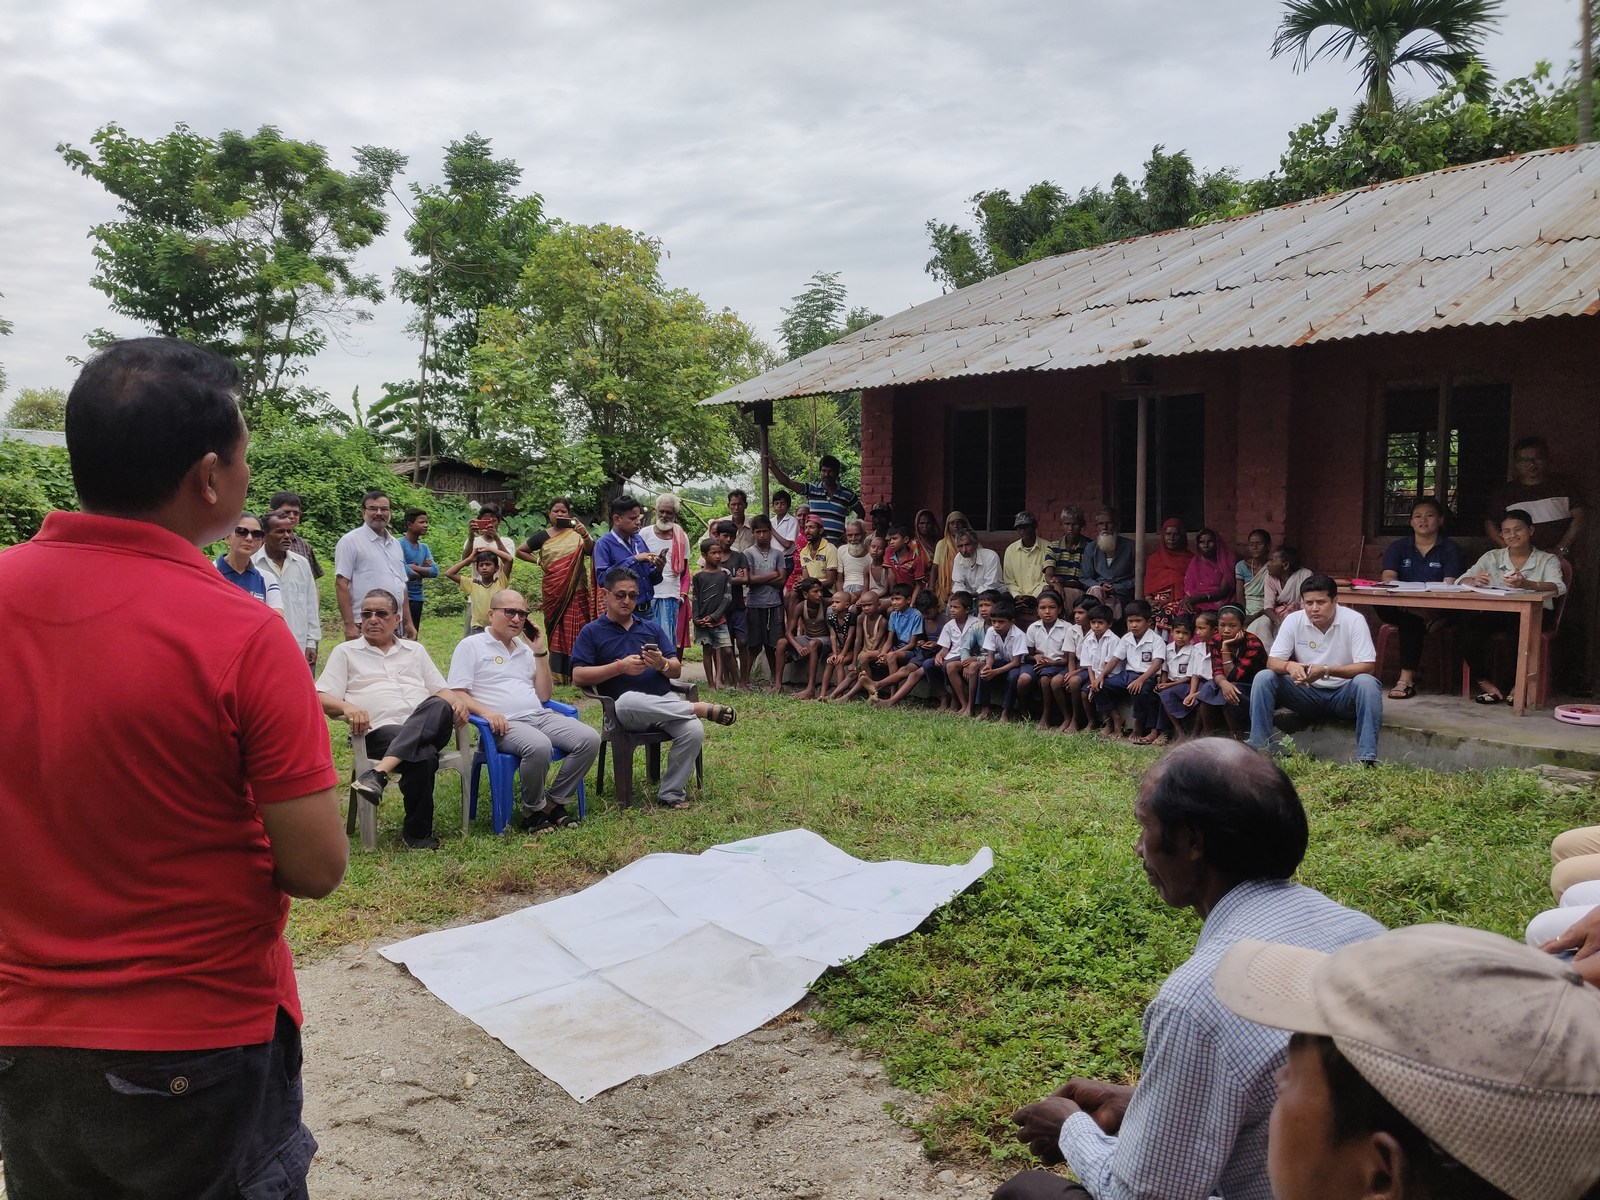 Free-Health-Camp-Eye-Screening-at-Gwala-Basti-Mechinagar-15-Jhapa-Nepal-Rotary-Club-of-Kakarvitta-16